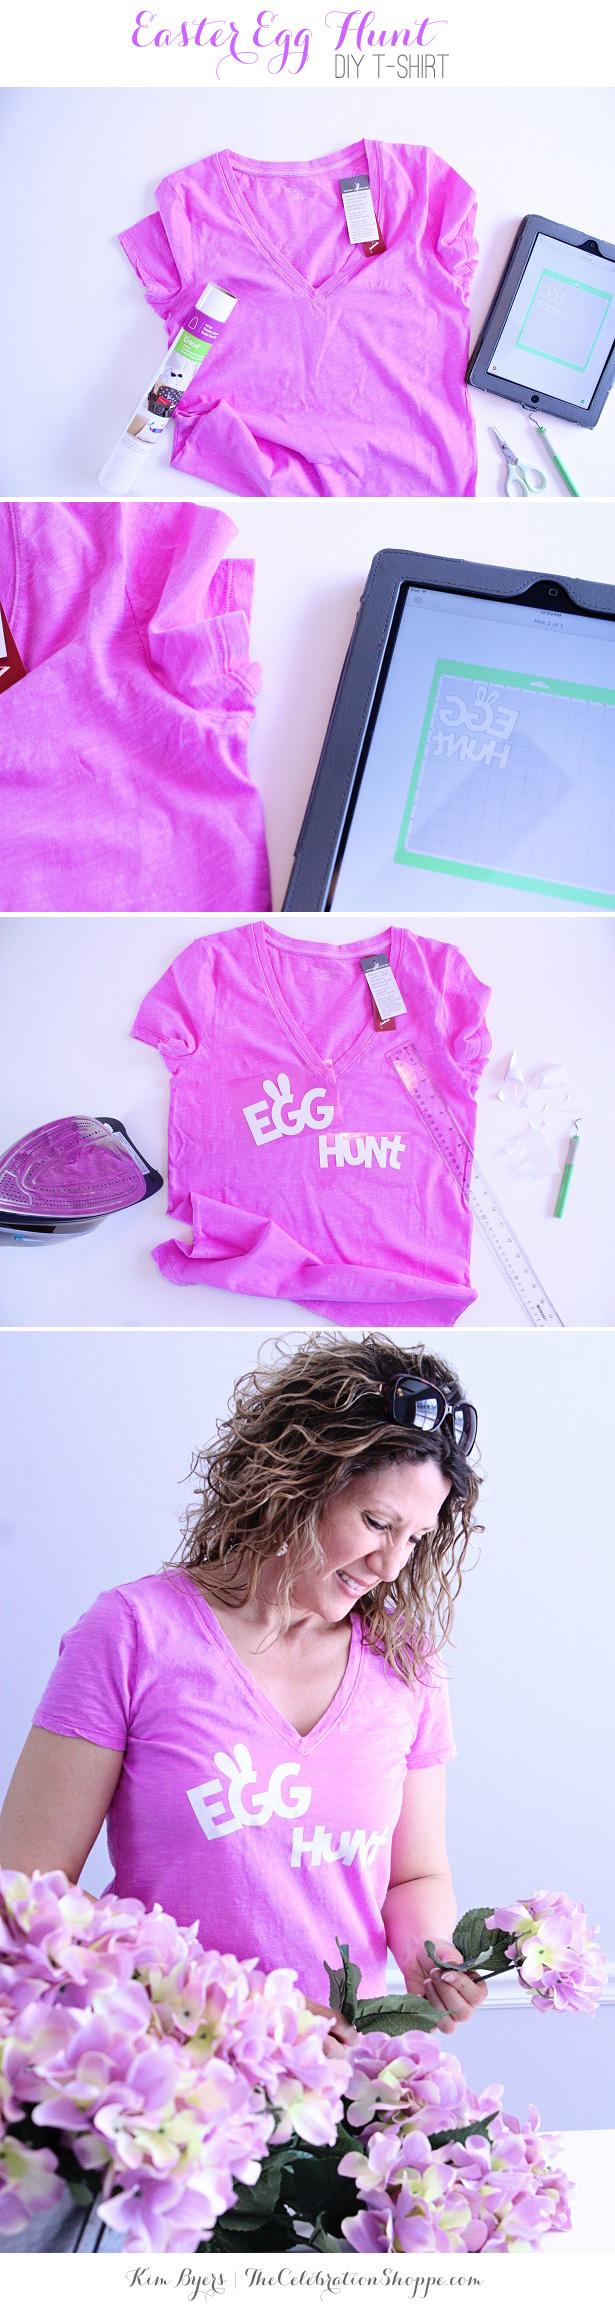 Easter Egg Hunt DIY T-Shirt | @kimbyers